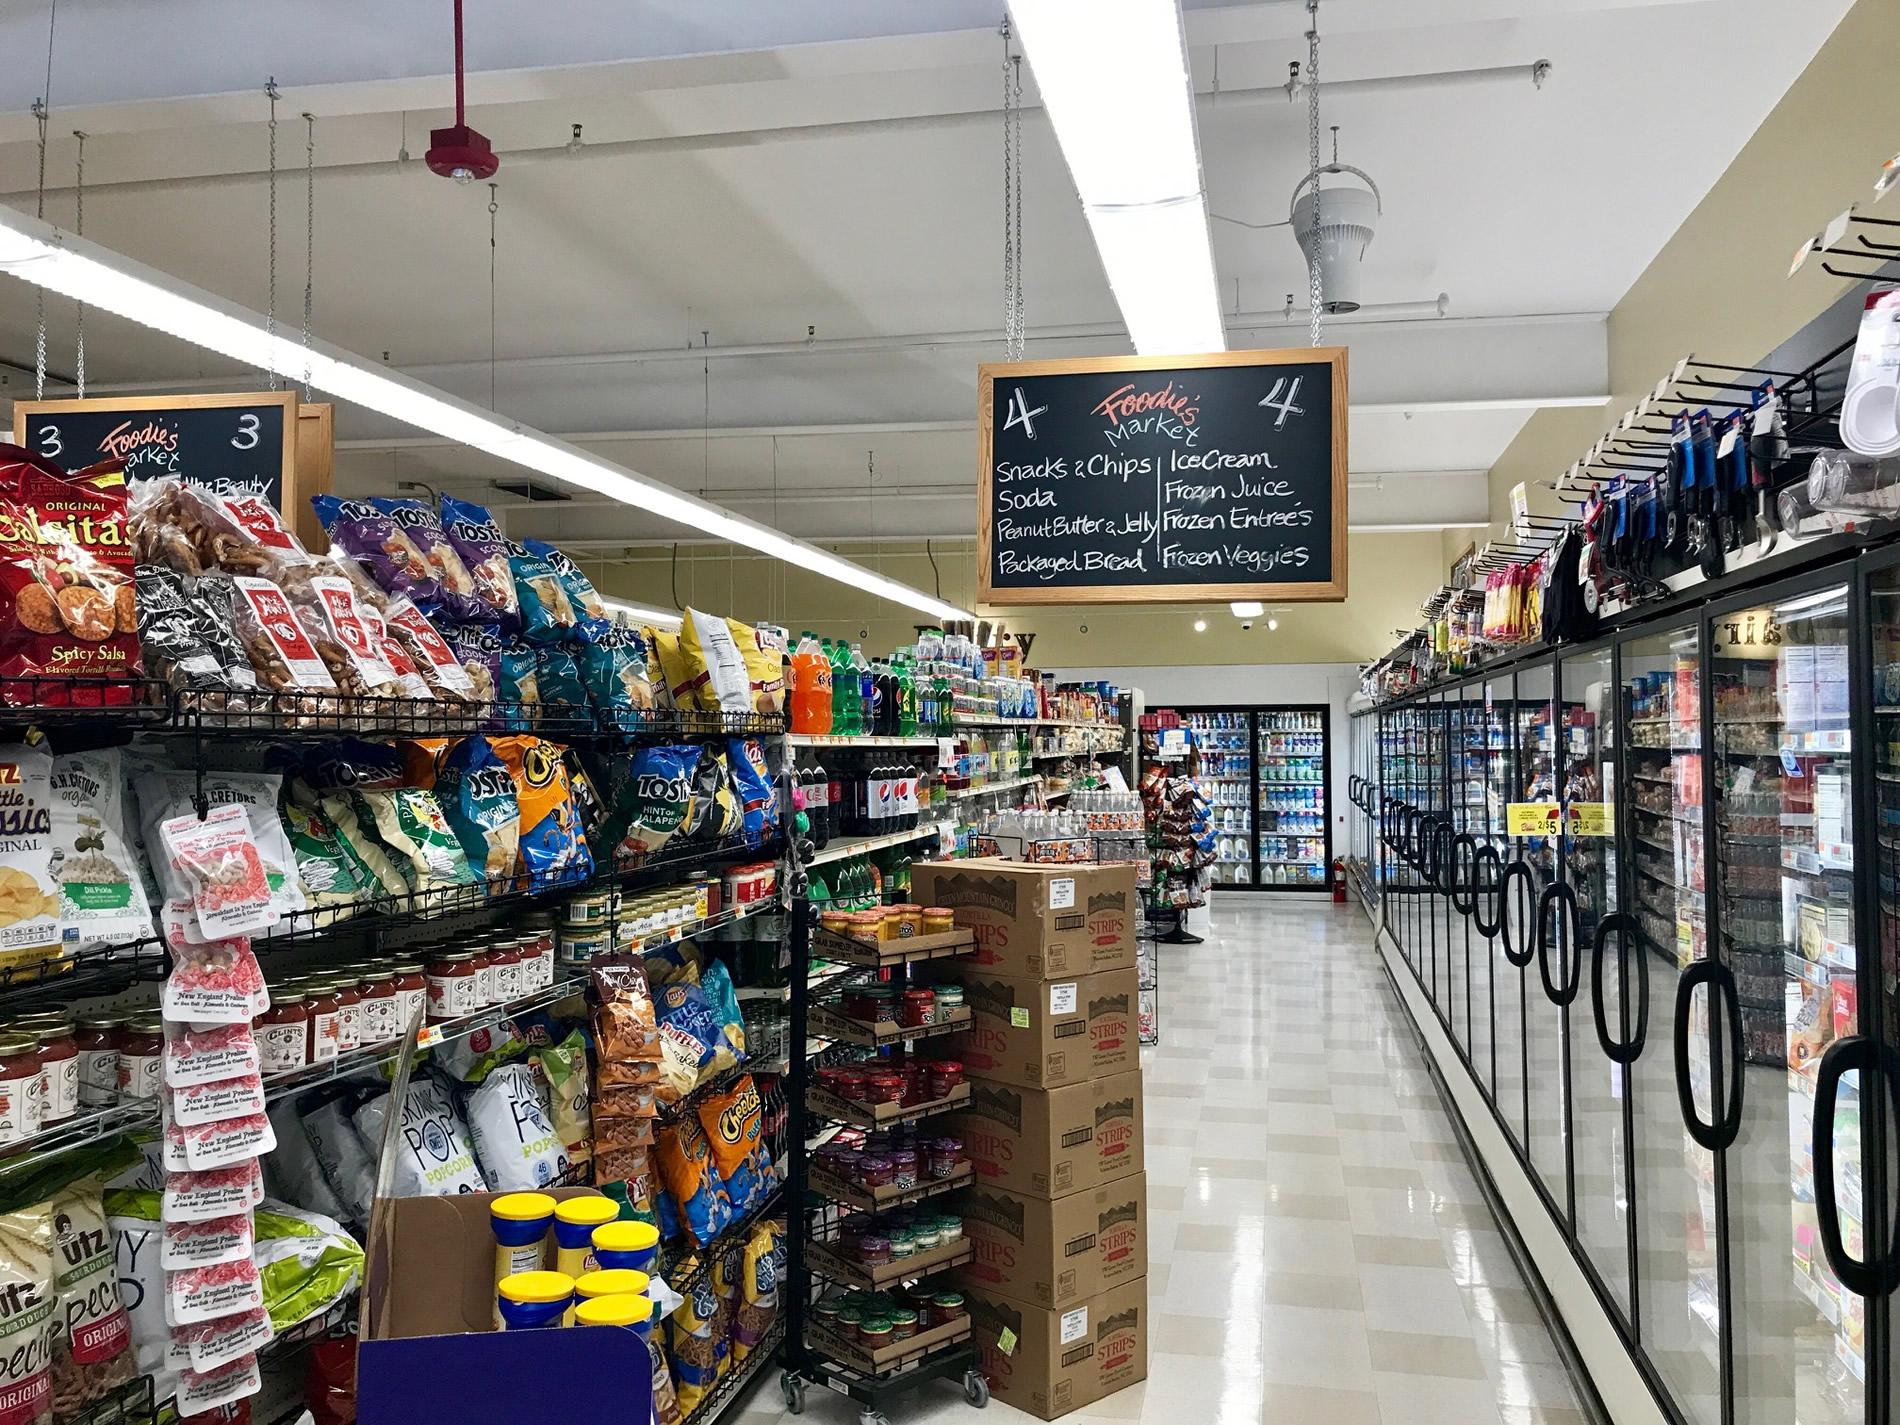 Foodies_Markets_South_Boston25